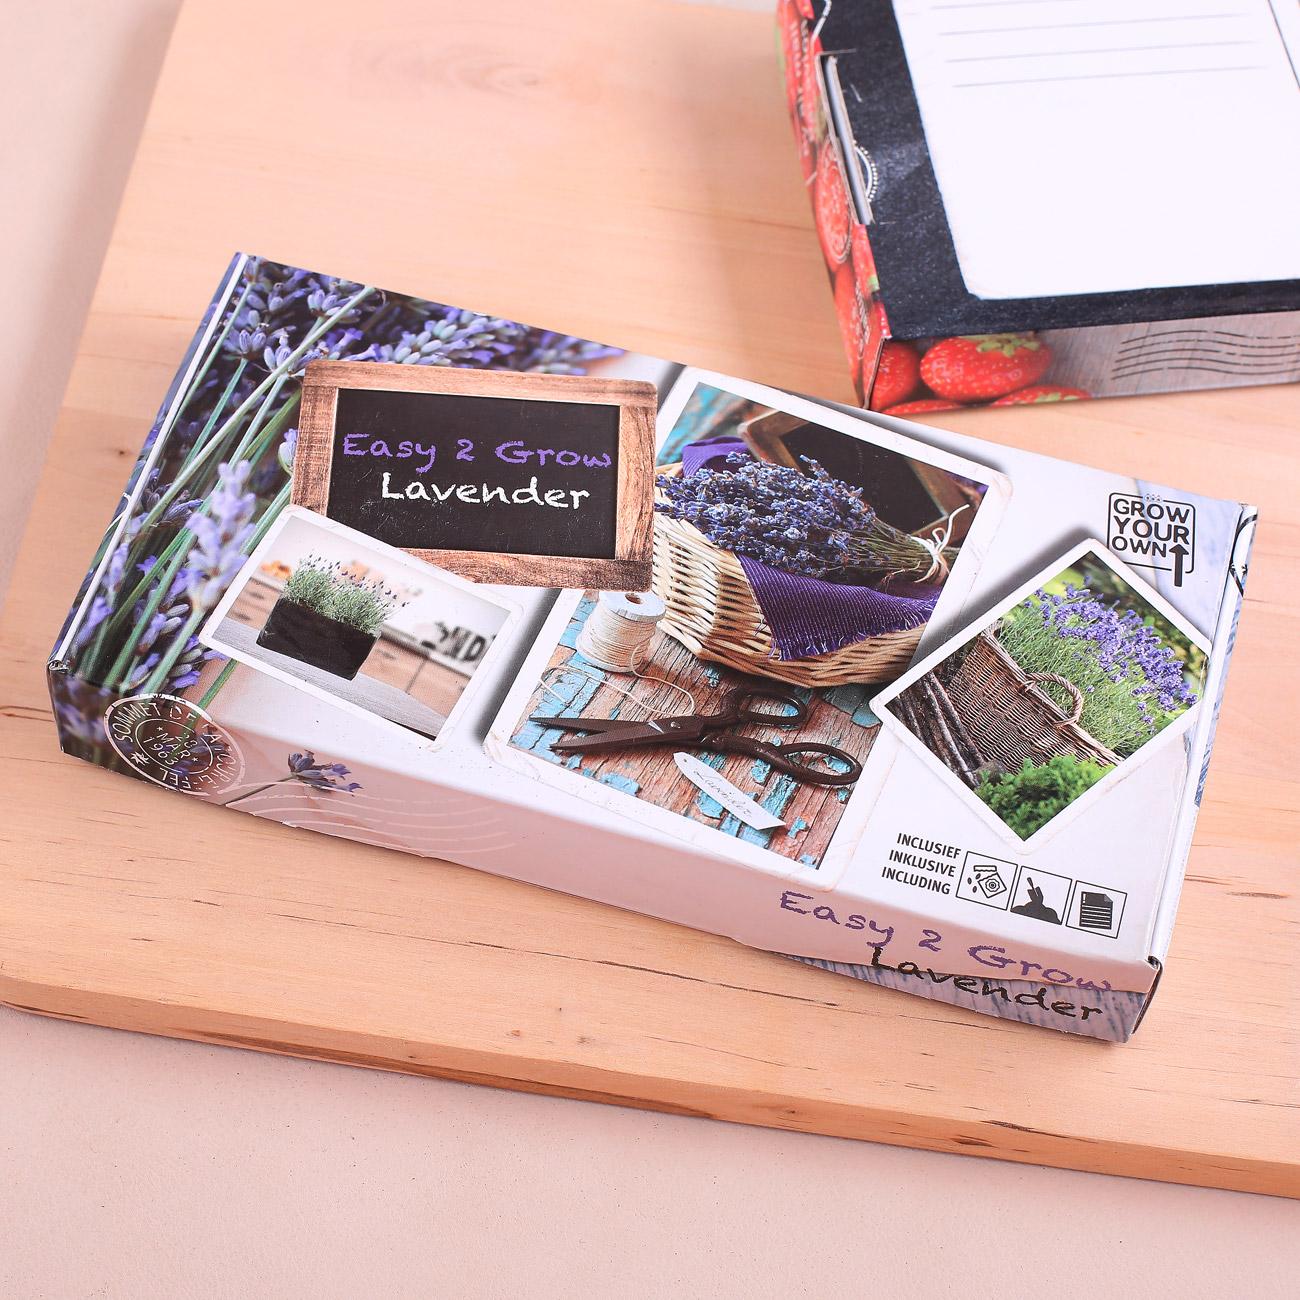 lavendelpflanze zum selber s en geschenke. Black Bedroom Furniture Sets. Home Design Ideas